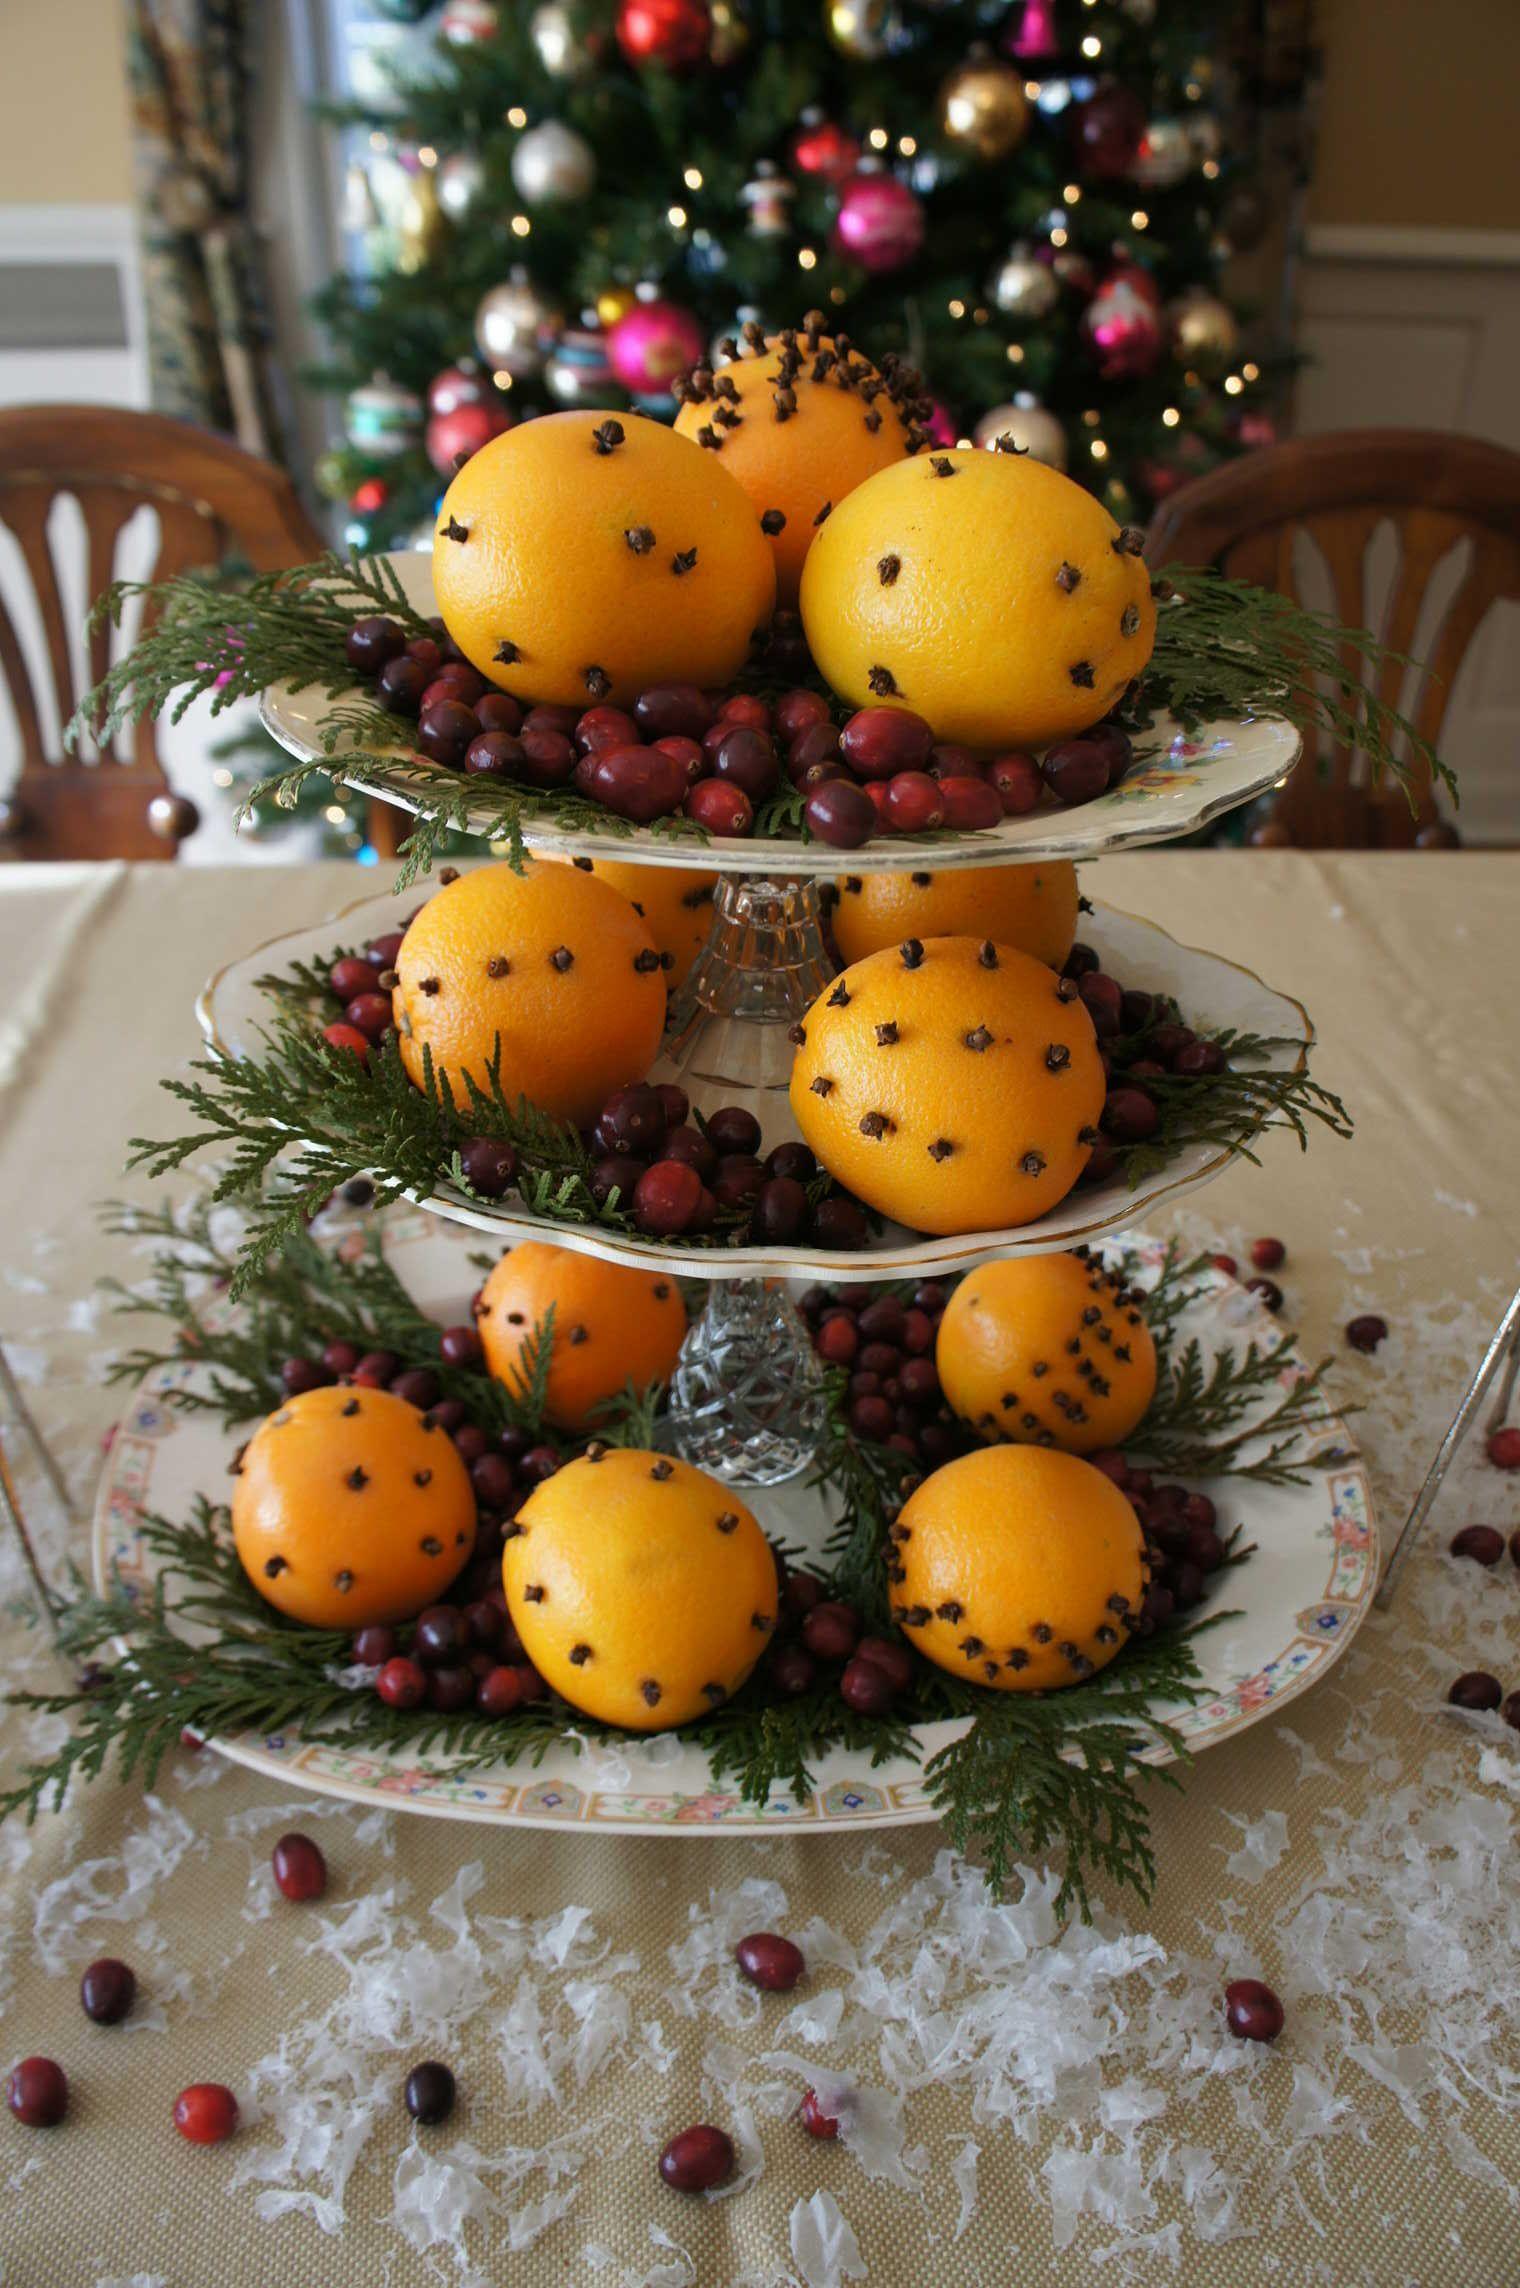 Diy christmas table decoration ideas - Natural Theme Diy Christmas Holiday Table Centerpiece Ideas On Awesome Three